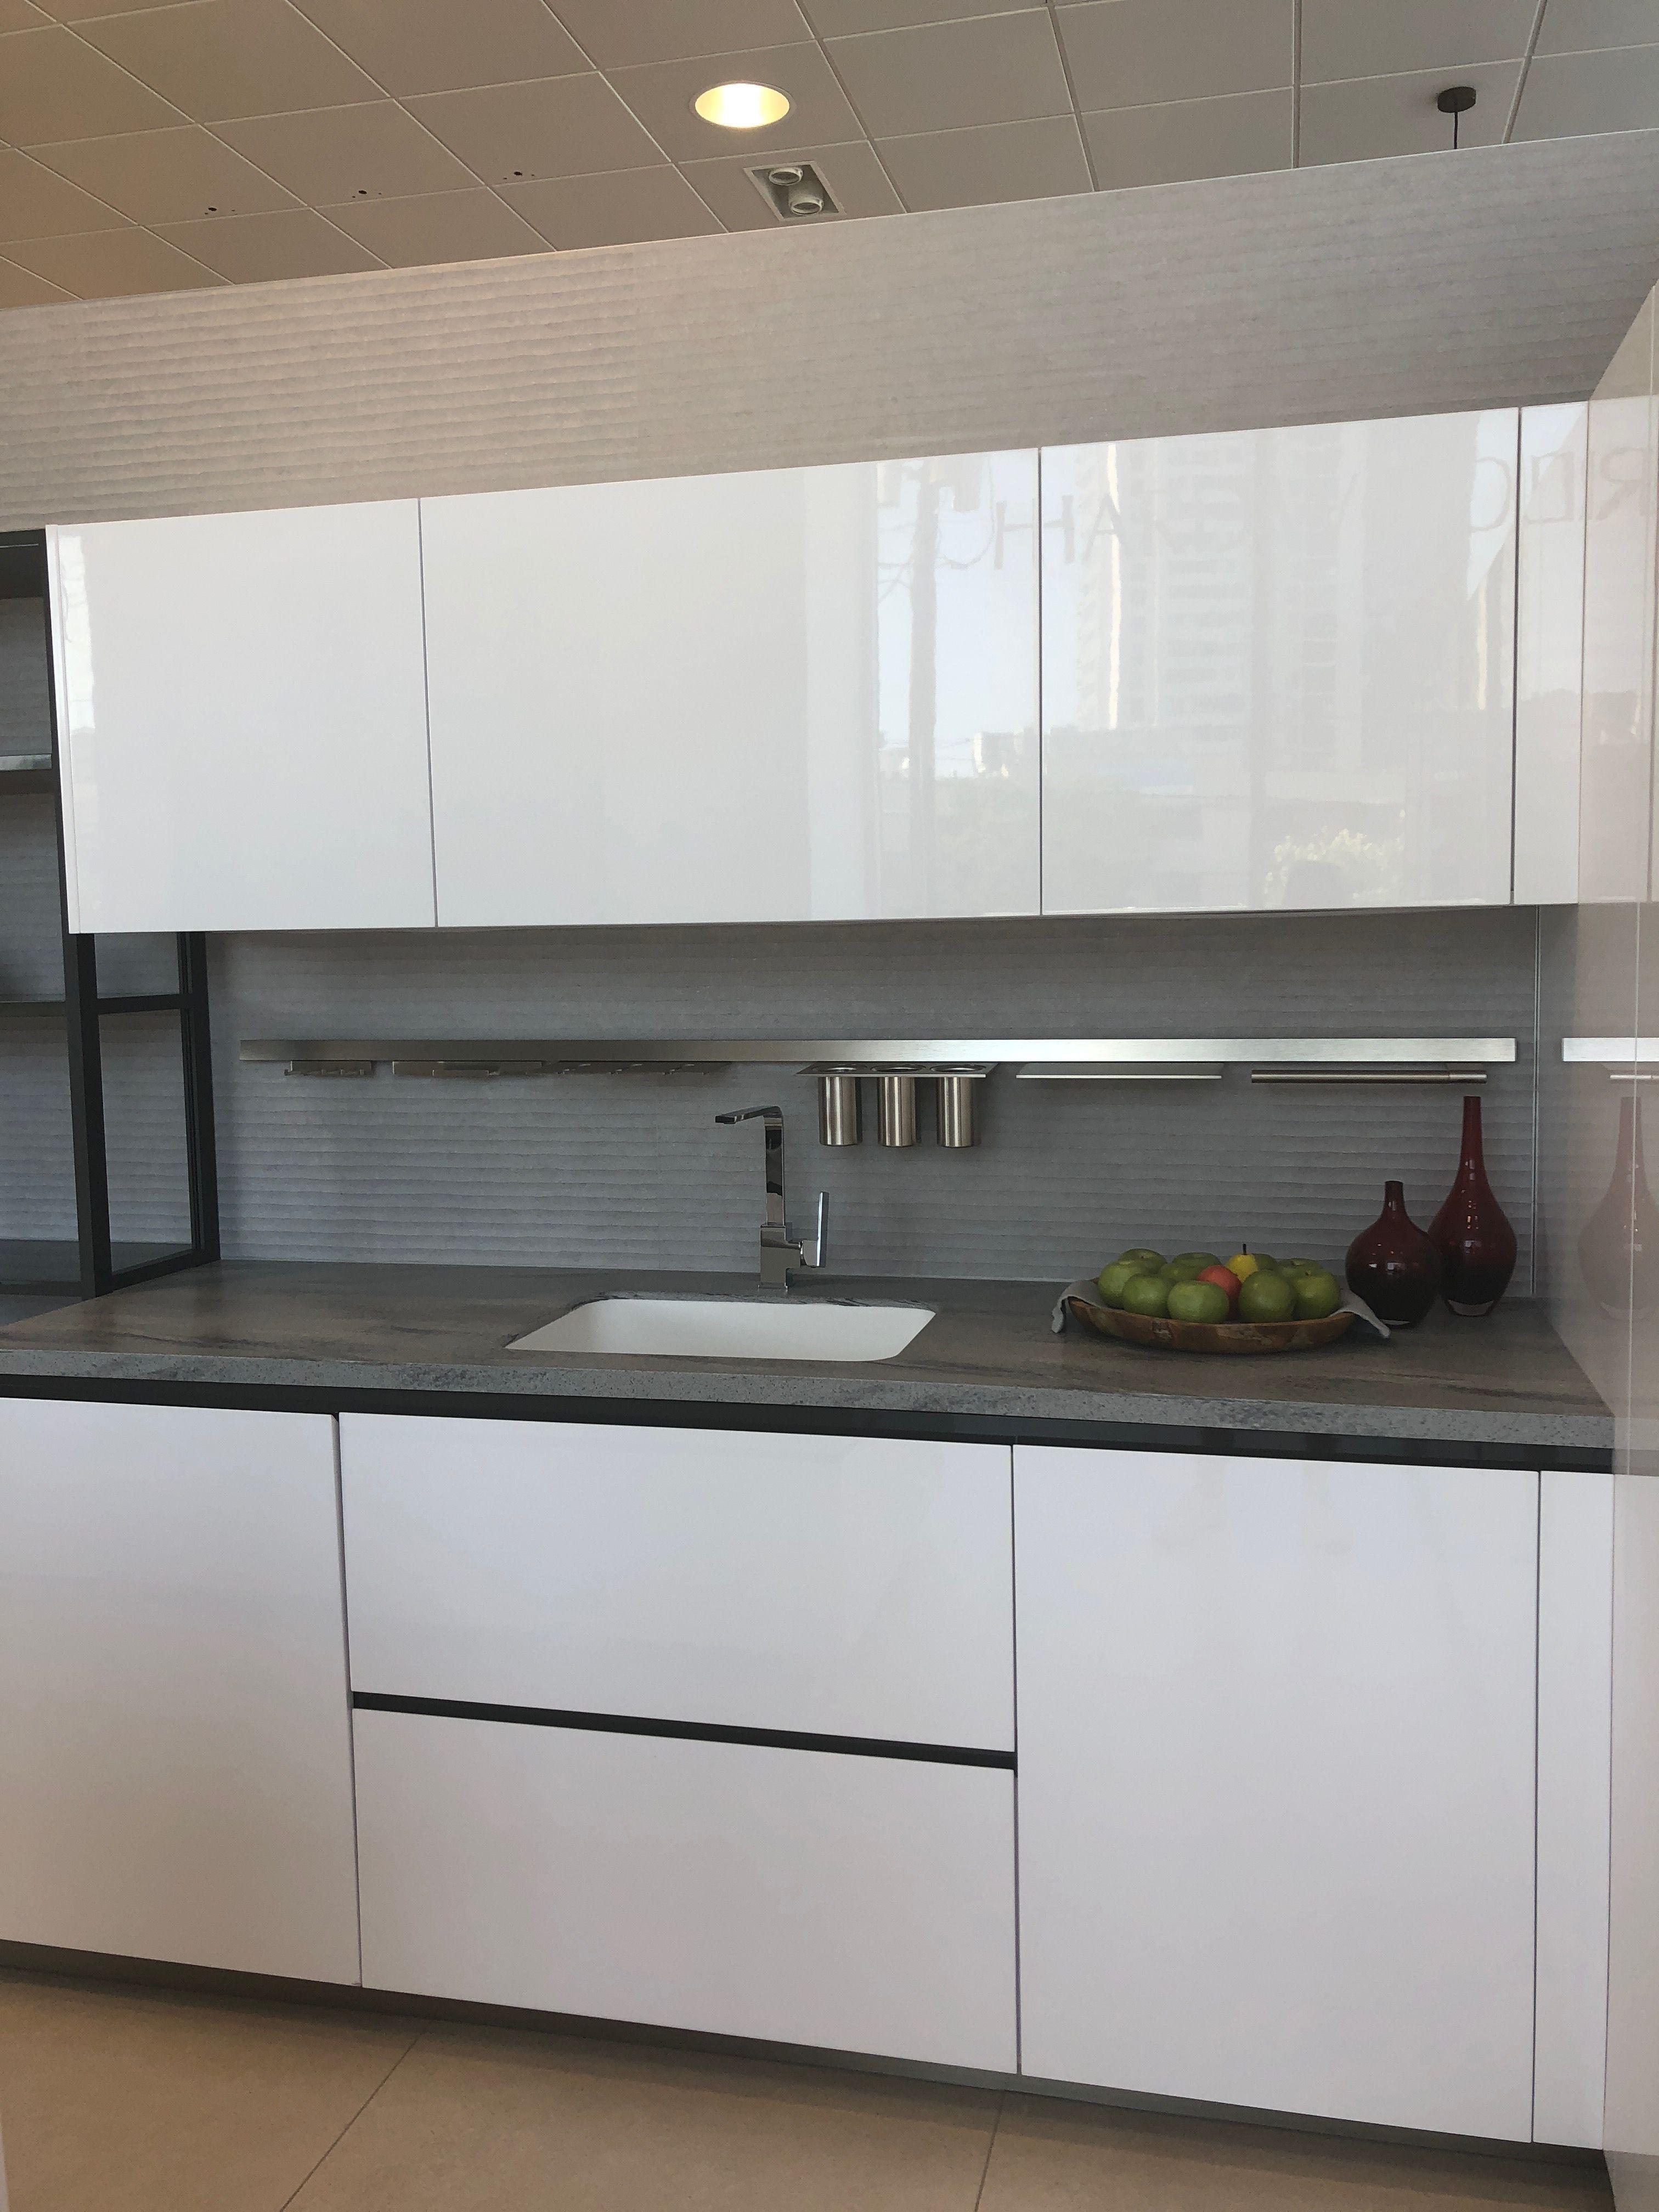 Pin By Lisa Blonder On Home Kitchen Home Kitchens Kitchen Cabinets Kitchen